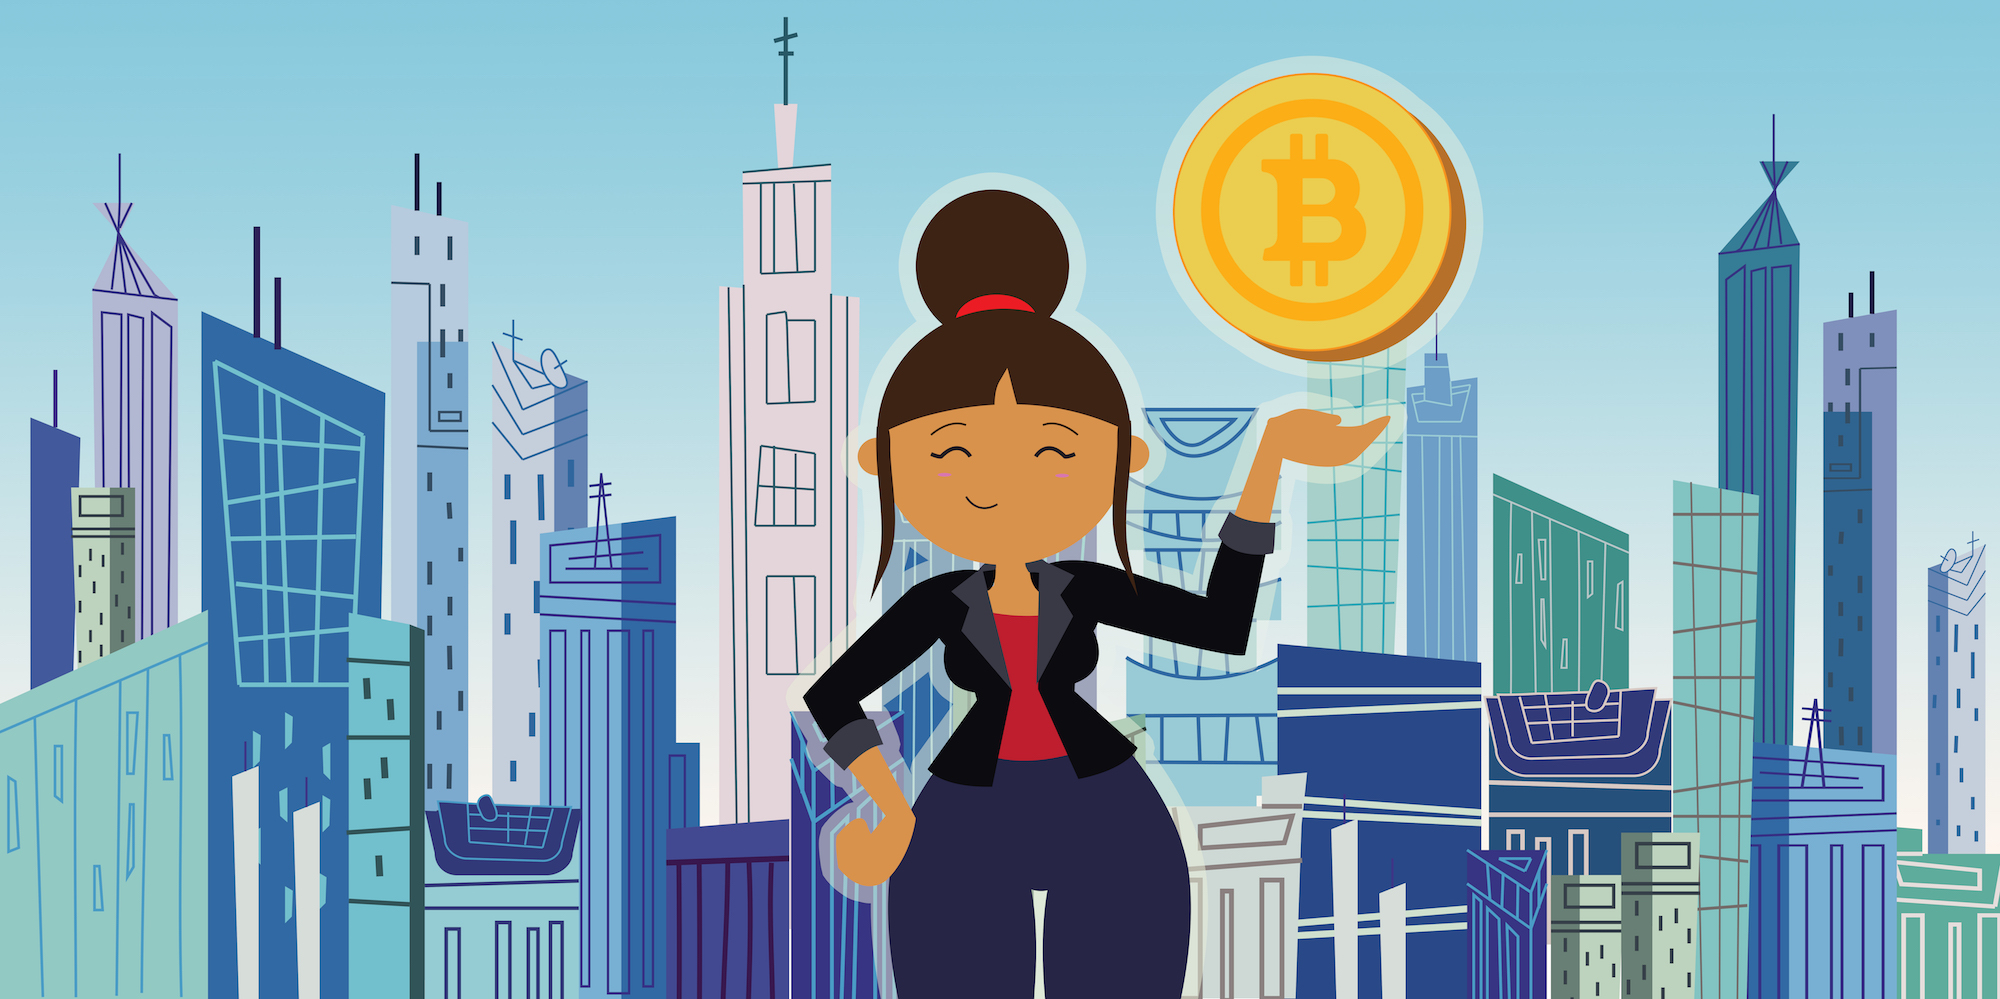 Blockchain bitcoin mujeres criptomonedas